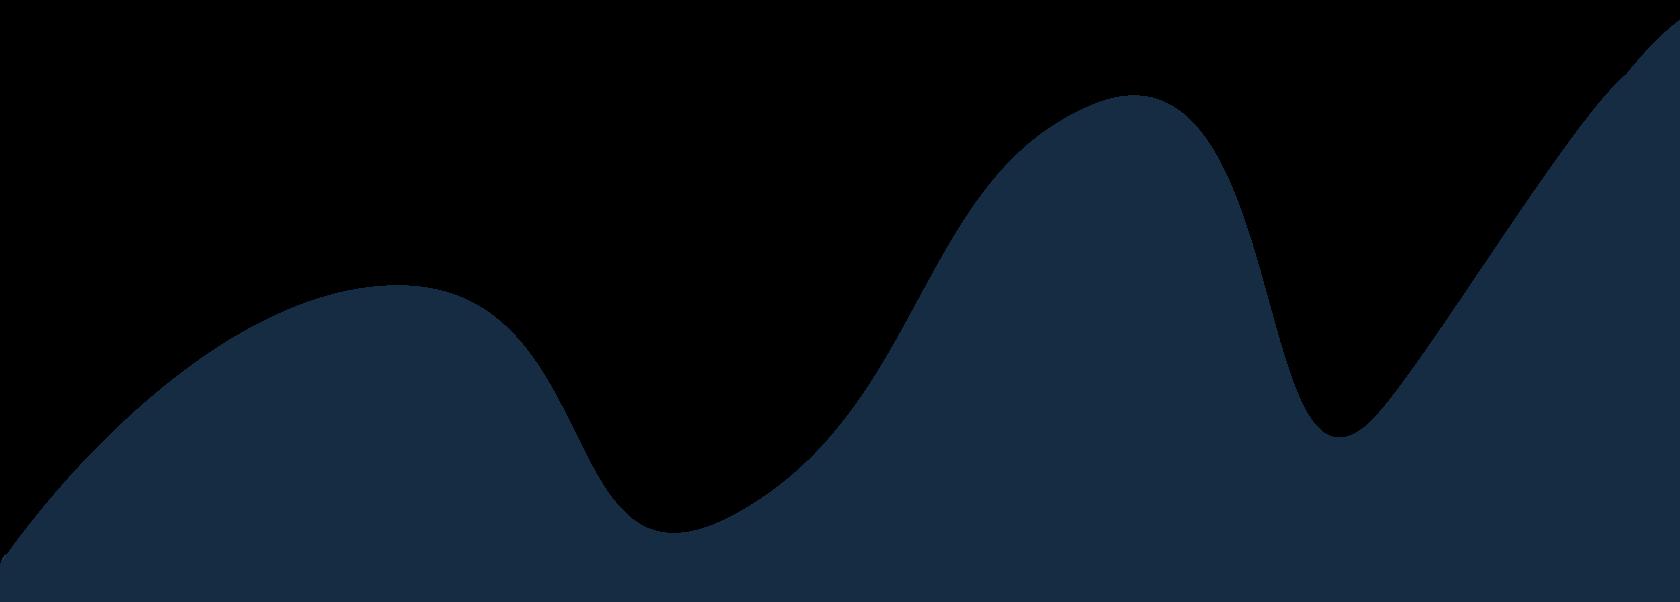 wave-image-bottom